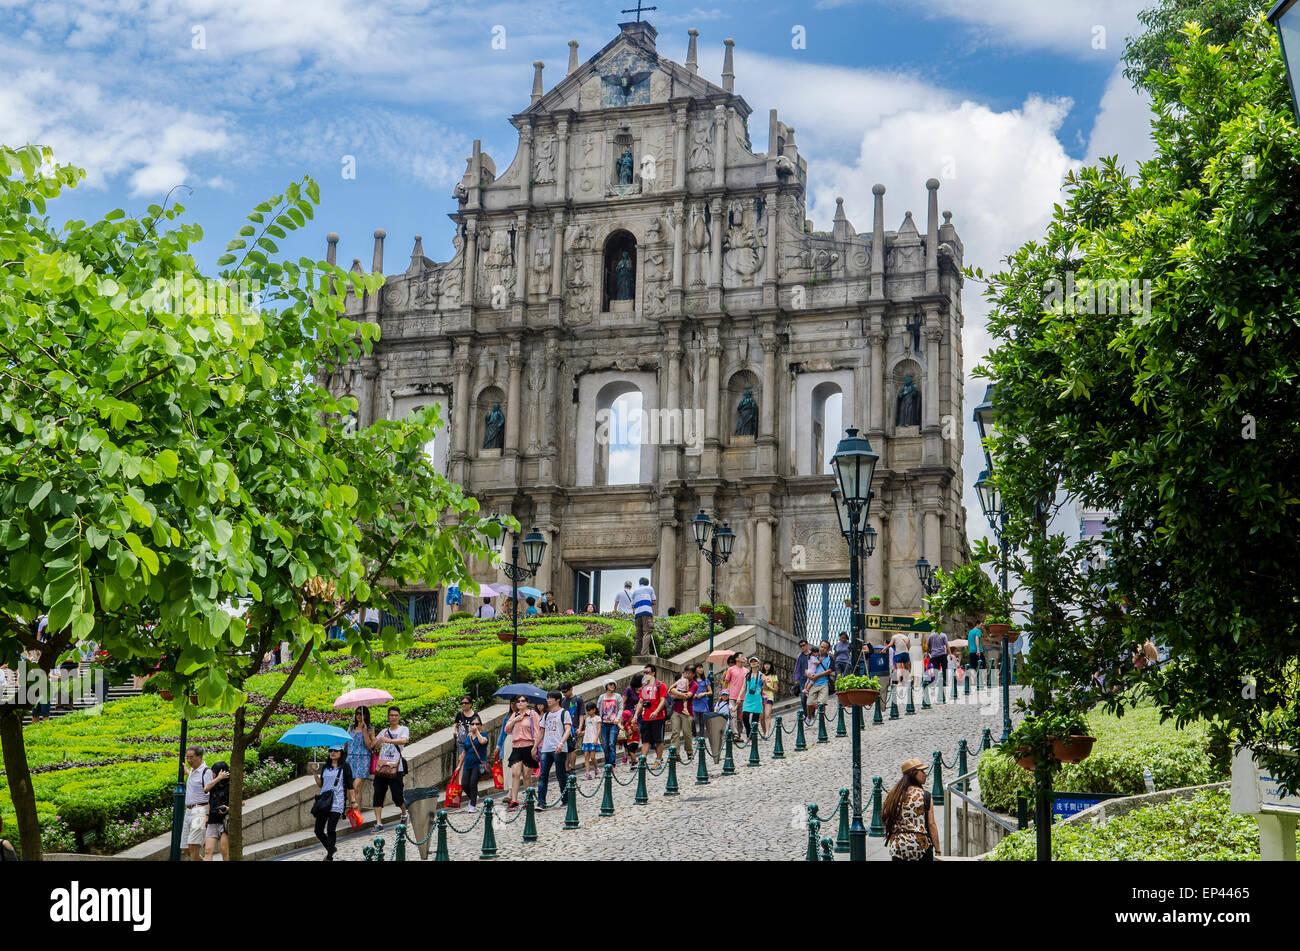 Ruin of Sao Paulo Church, Old city of Macau, China - Stock Image